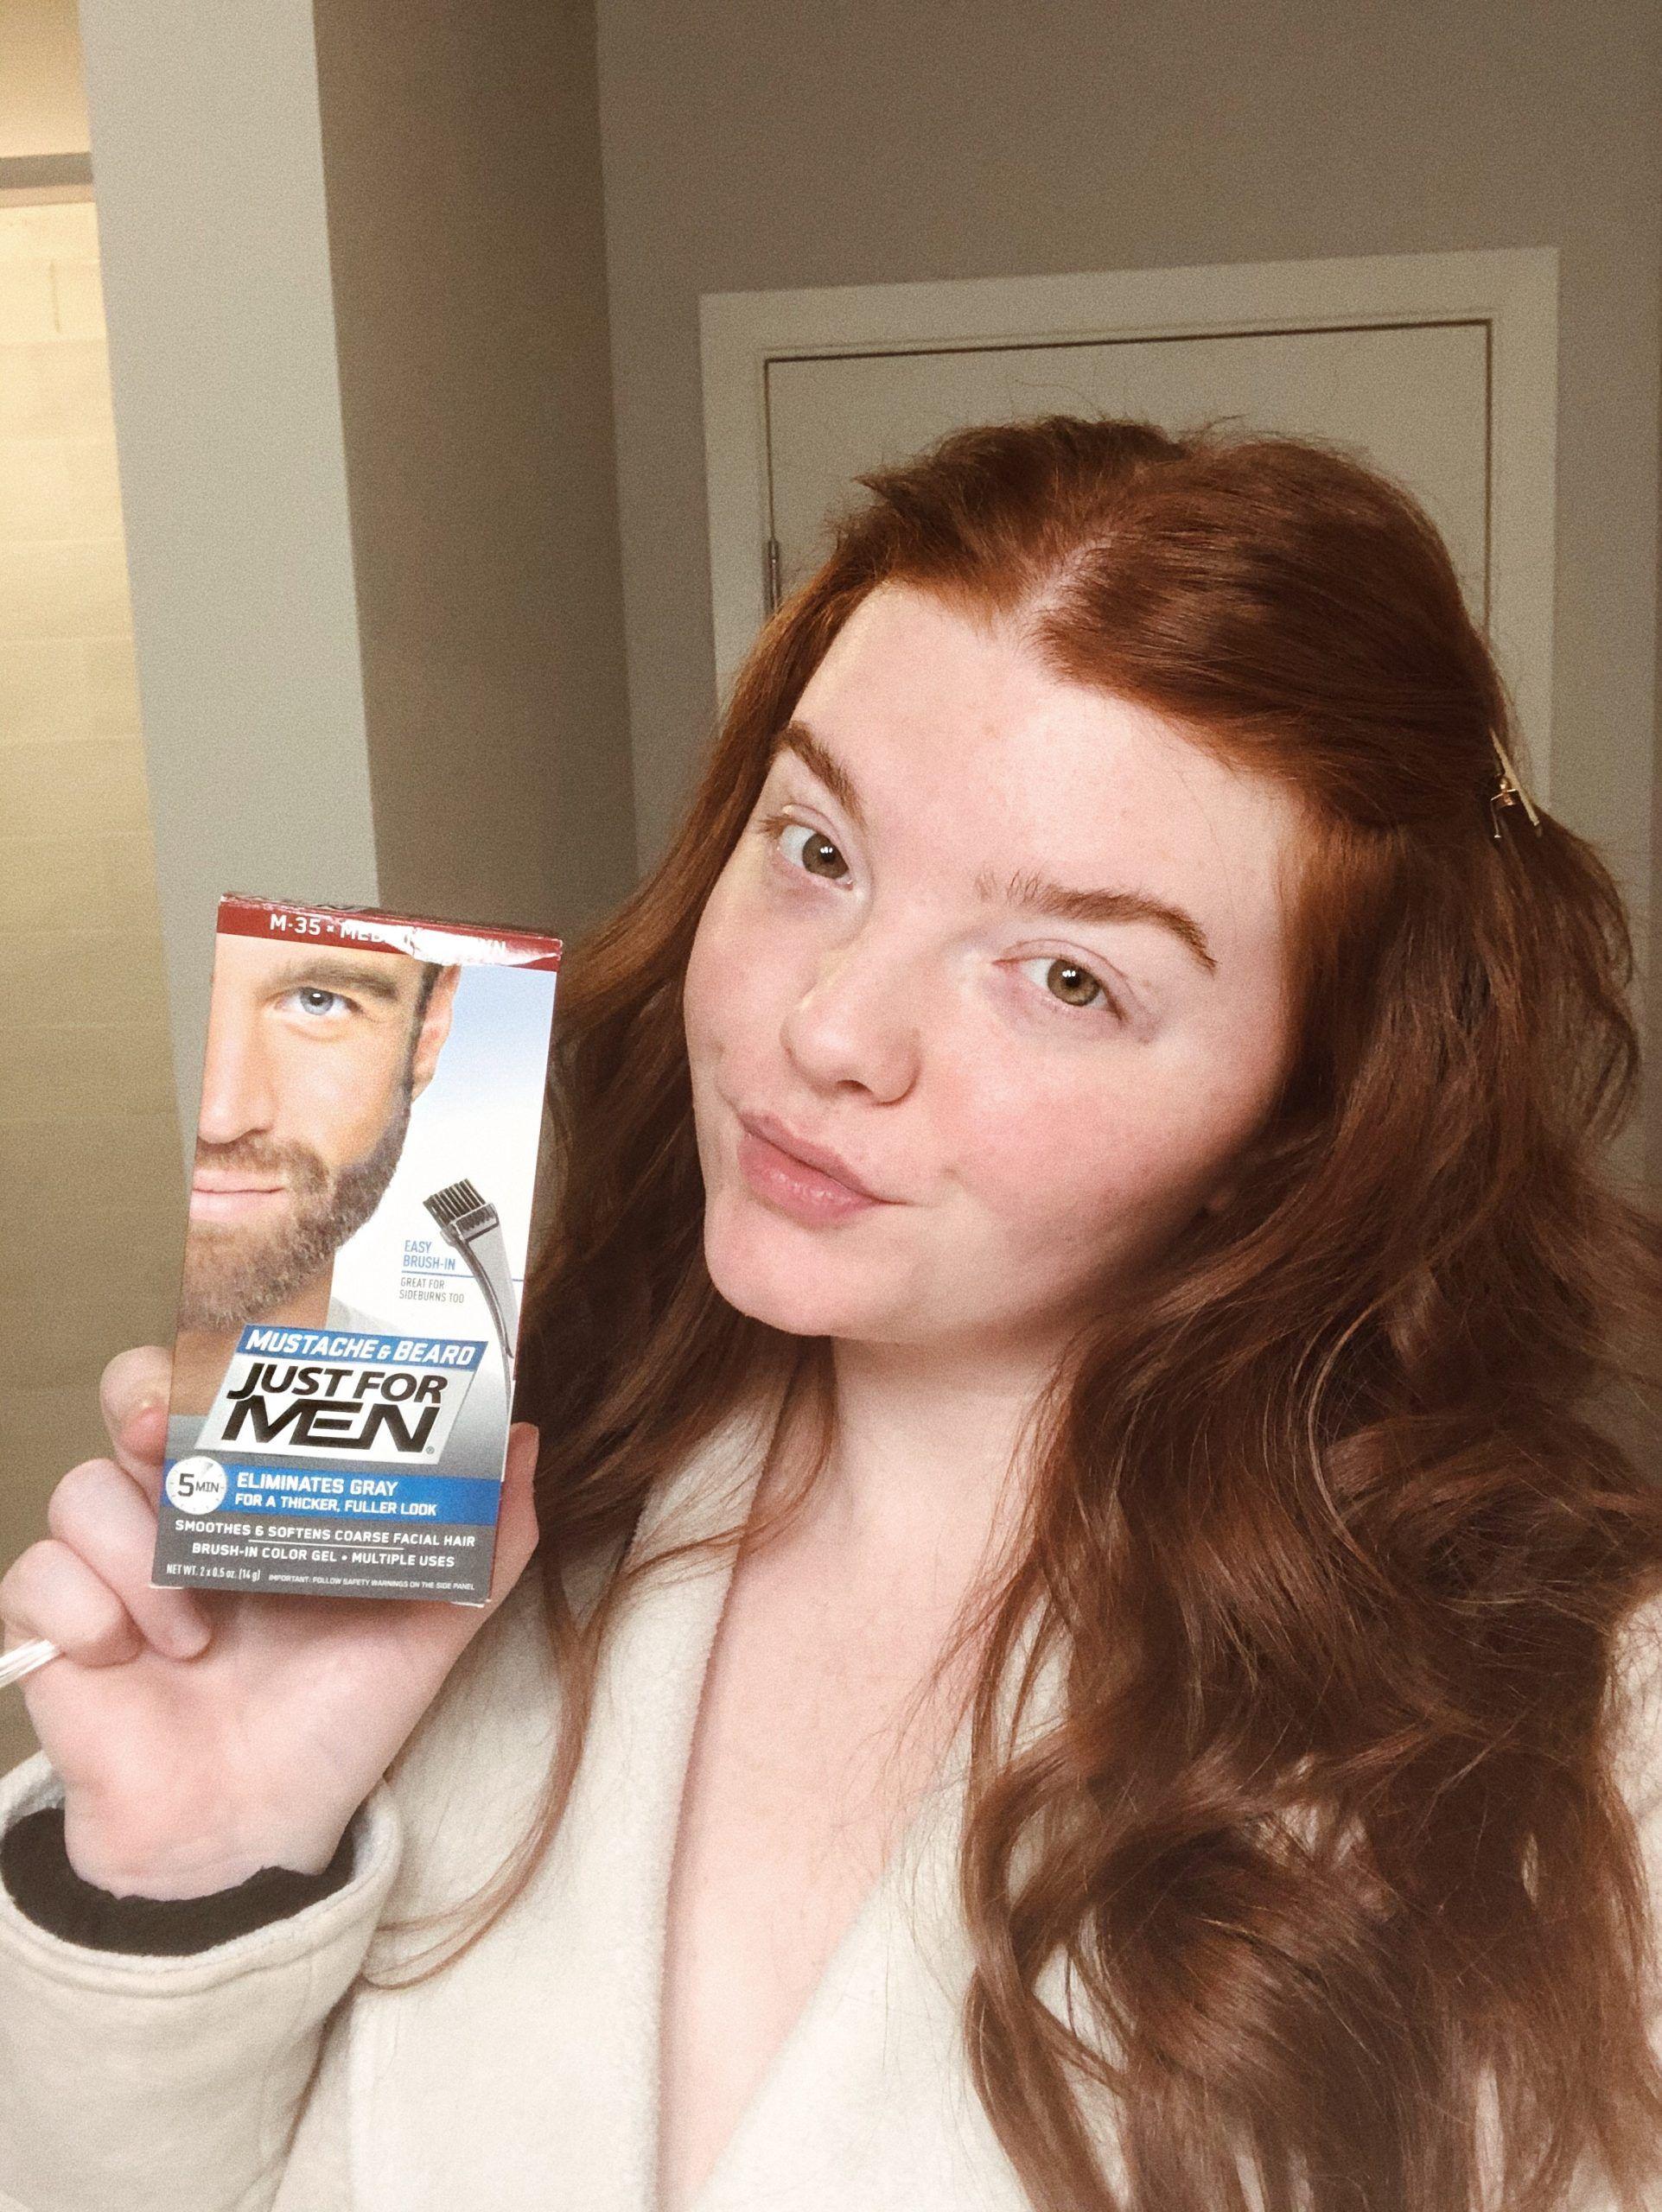 How I Tint My Brows At Home Radiantlyrae In 2020 Dye Eyebrows Dark Eyebrows Best Eyebrow Tint